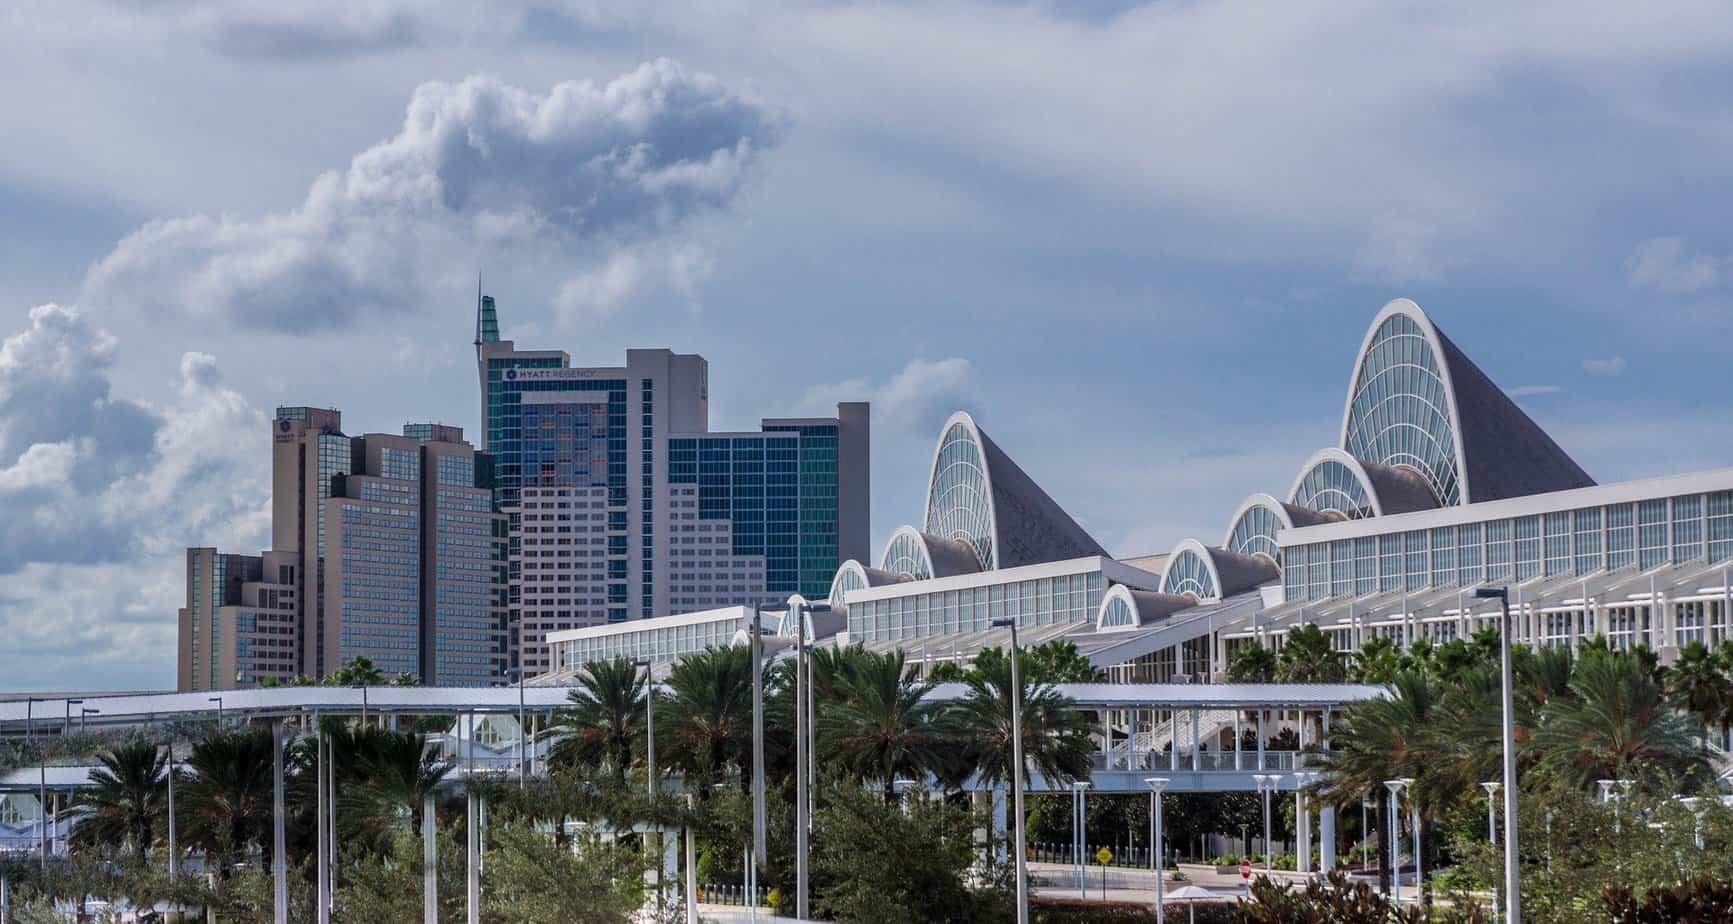 Wat is er te doen in Orlando, Florida?